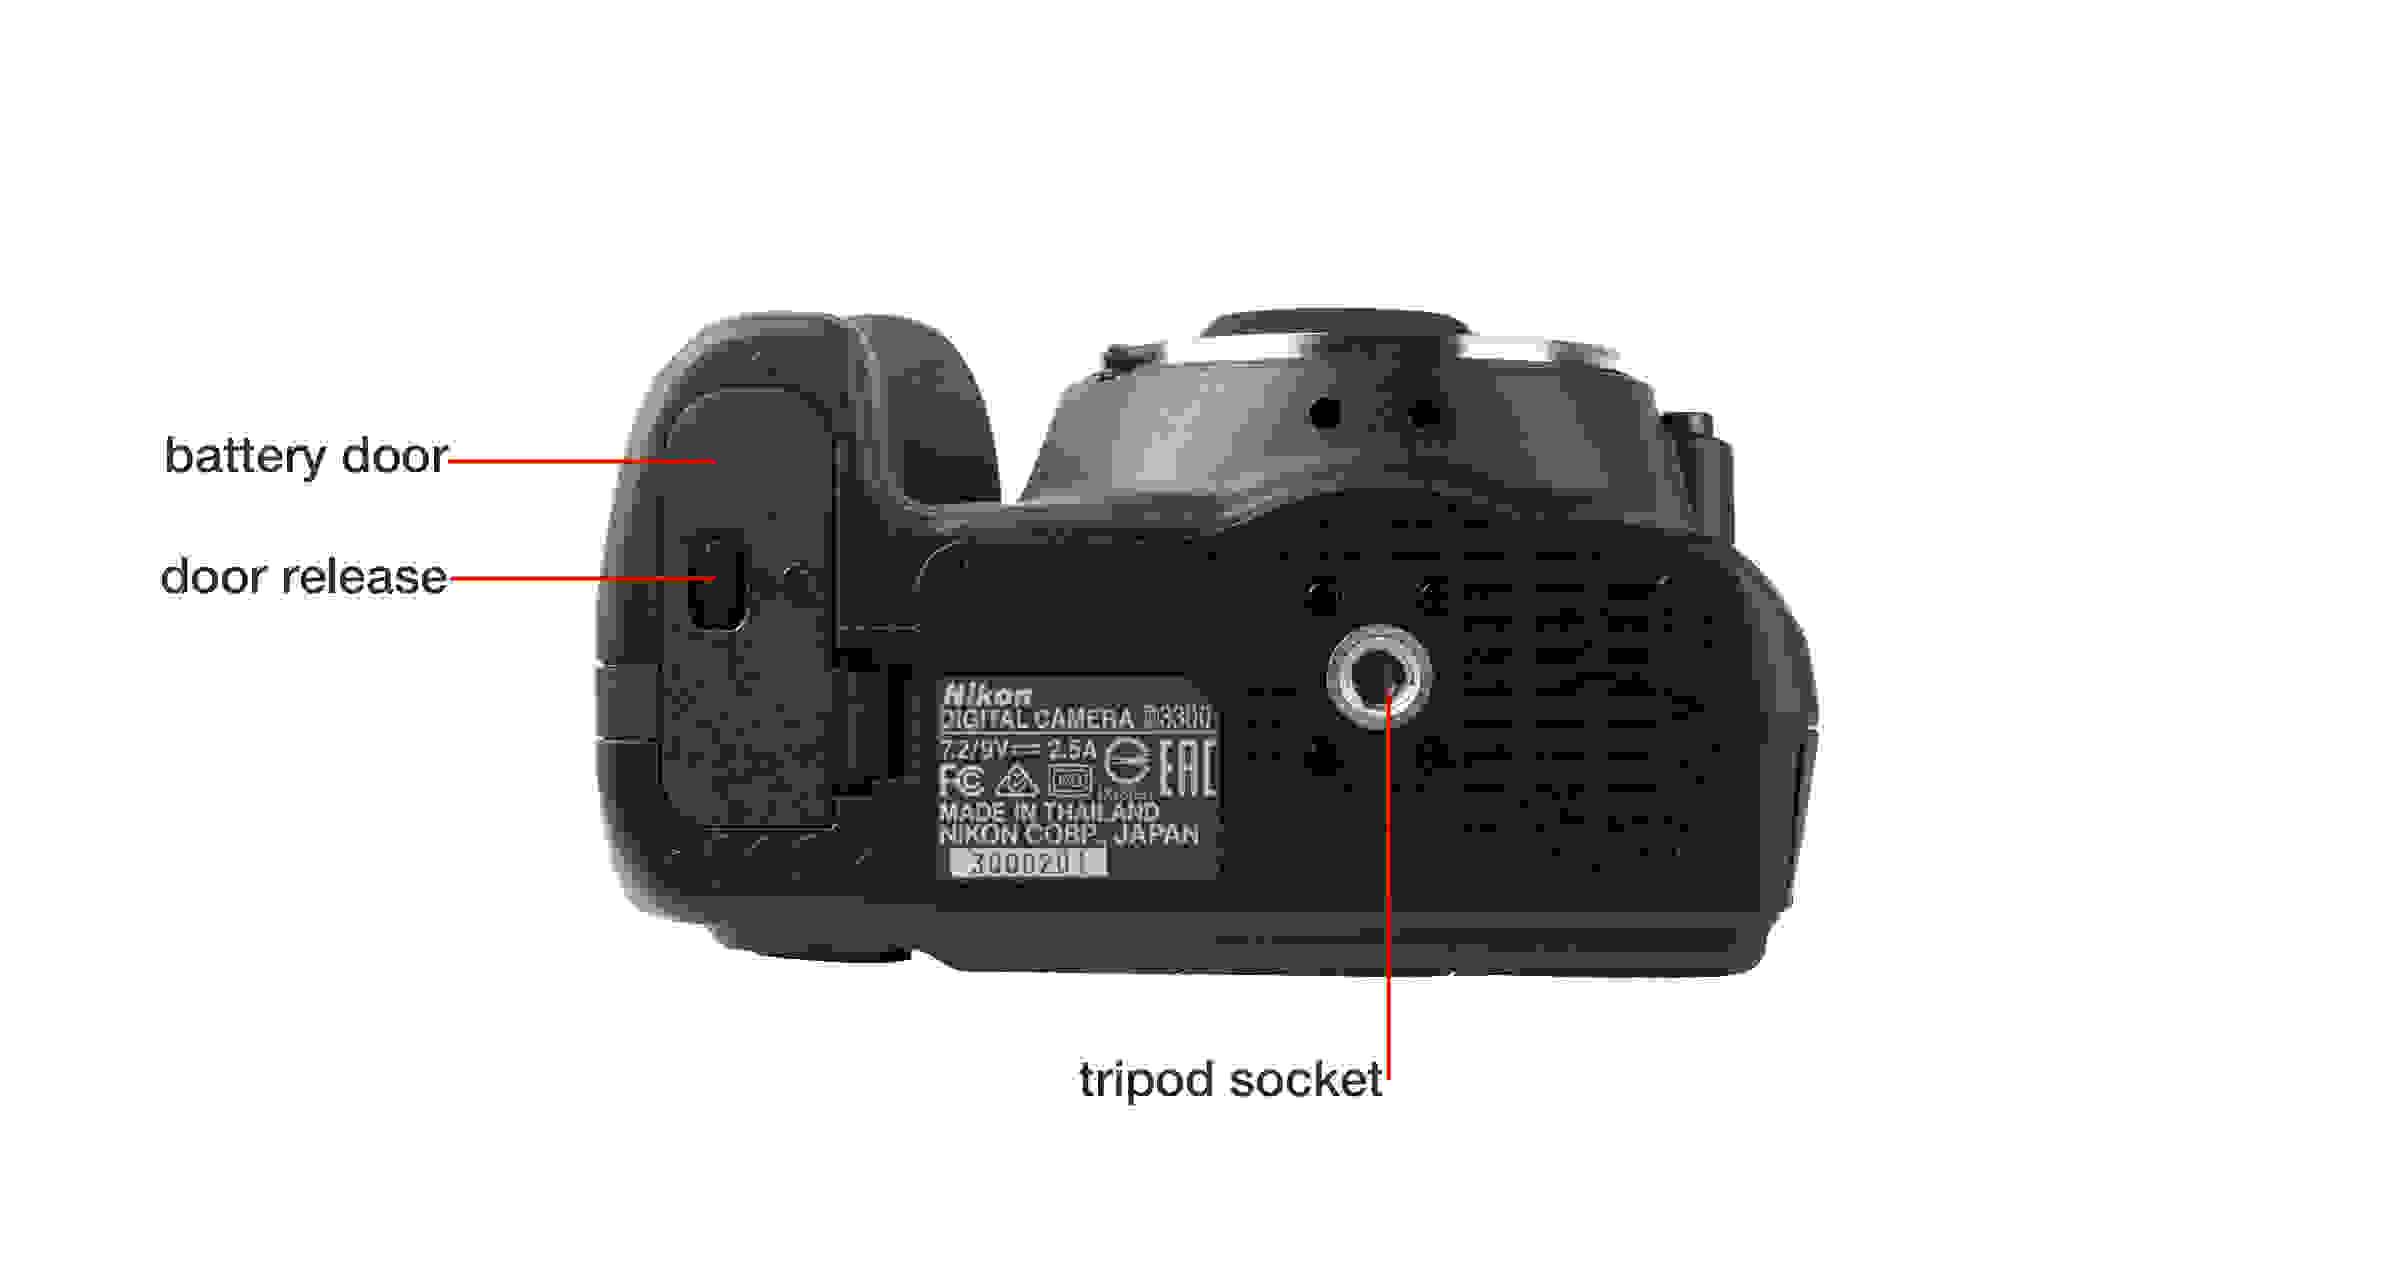 Bottom of Nikon D3300